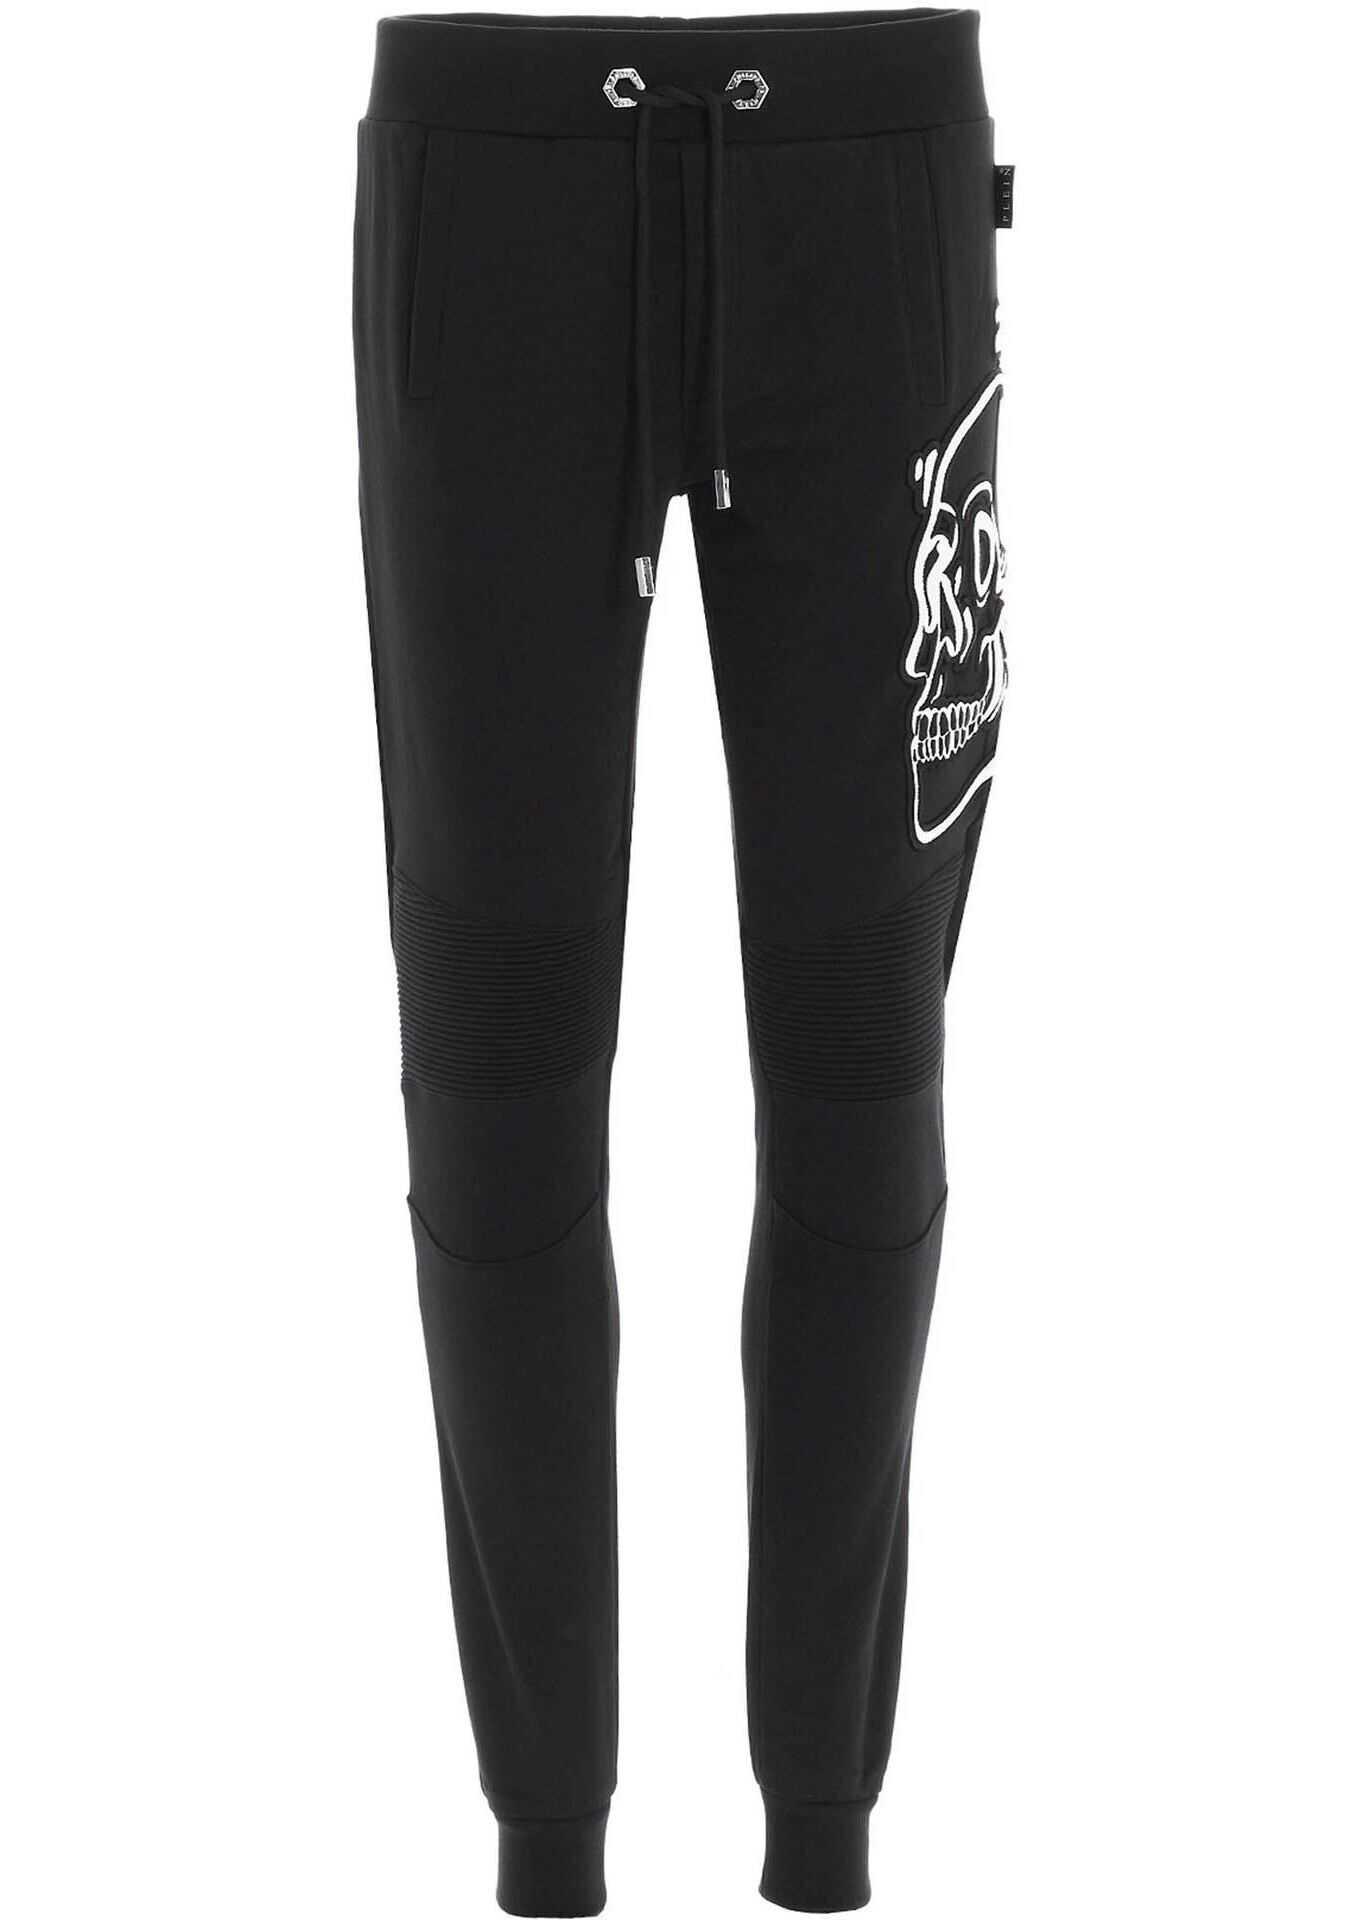 Philipp Plein Skull Jogging Pants In Black And White Black imagine